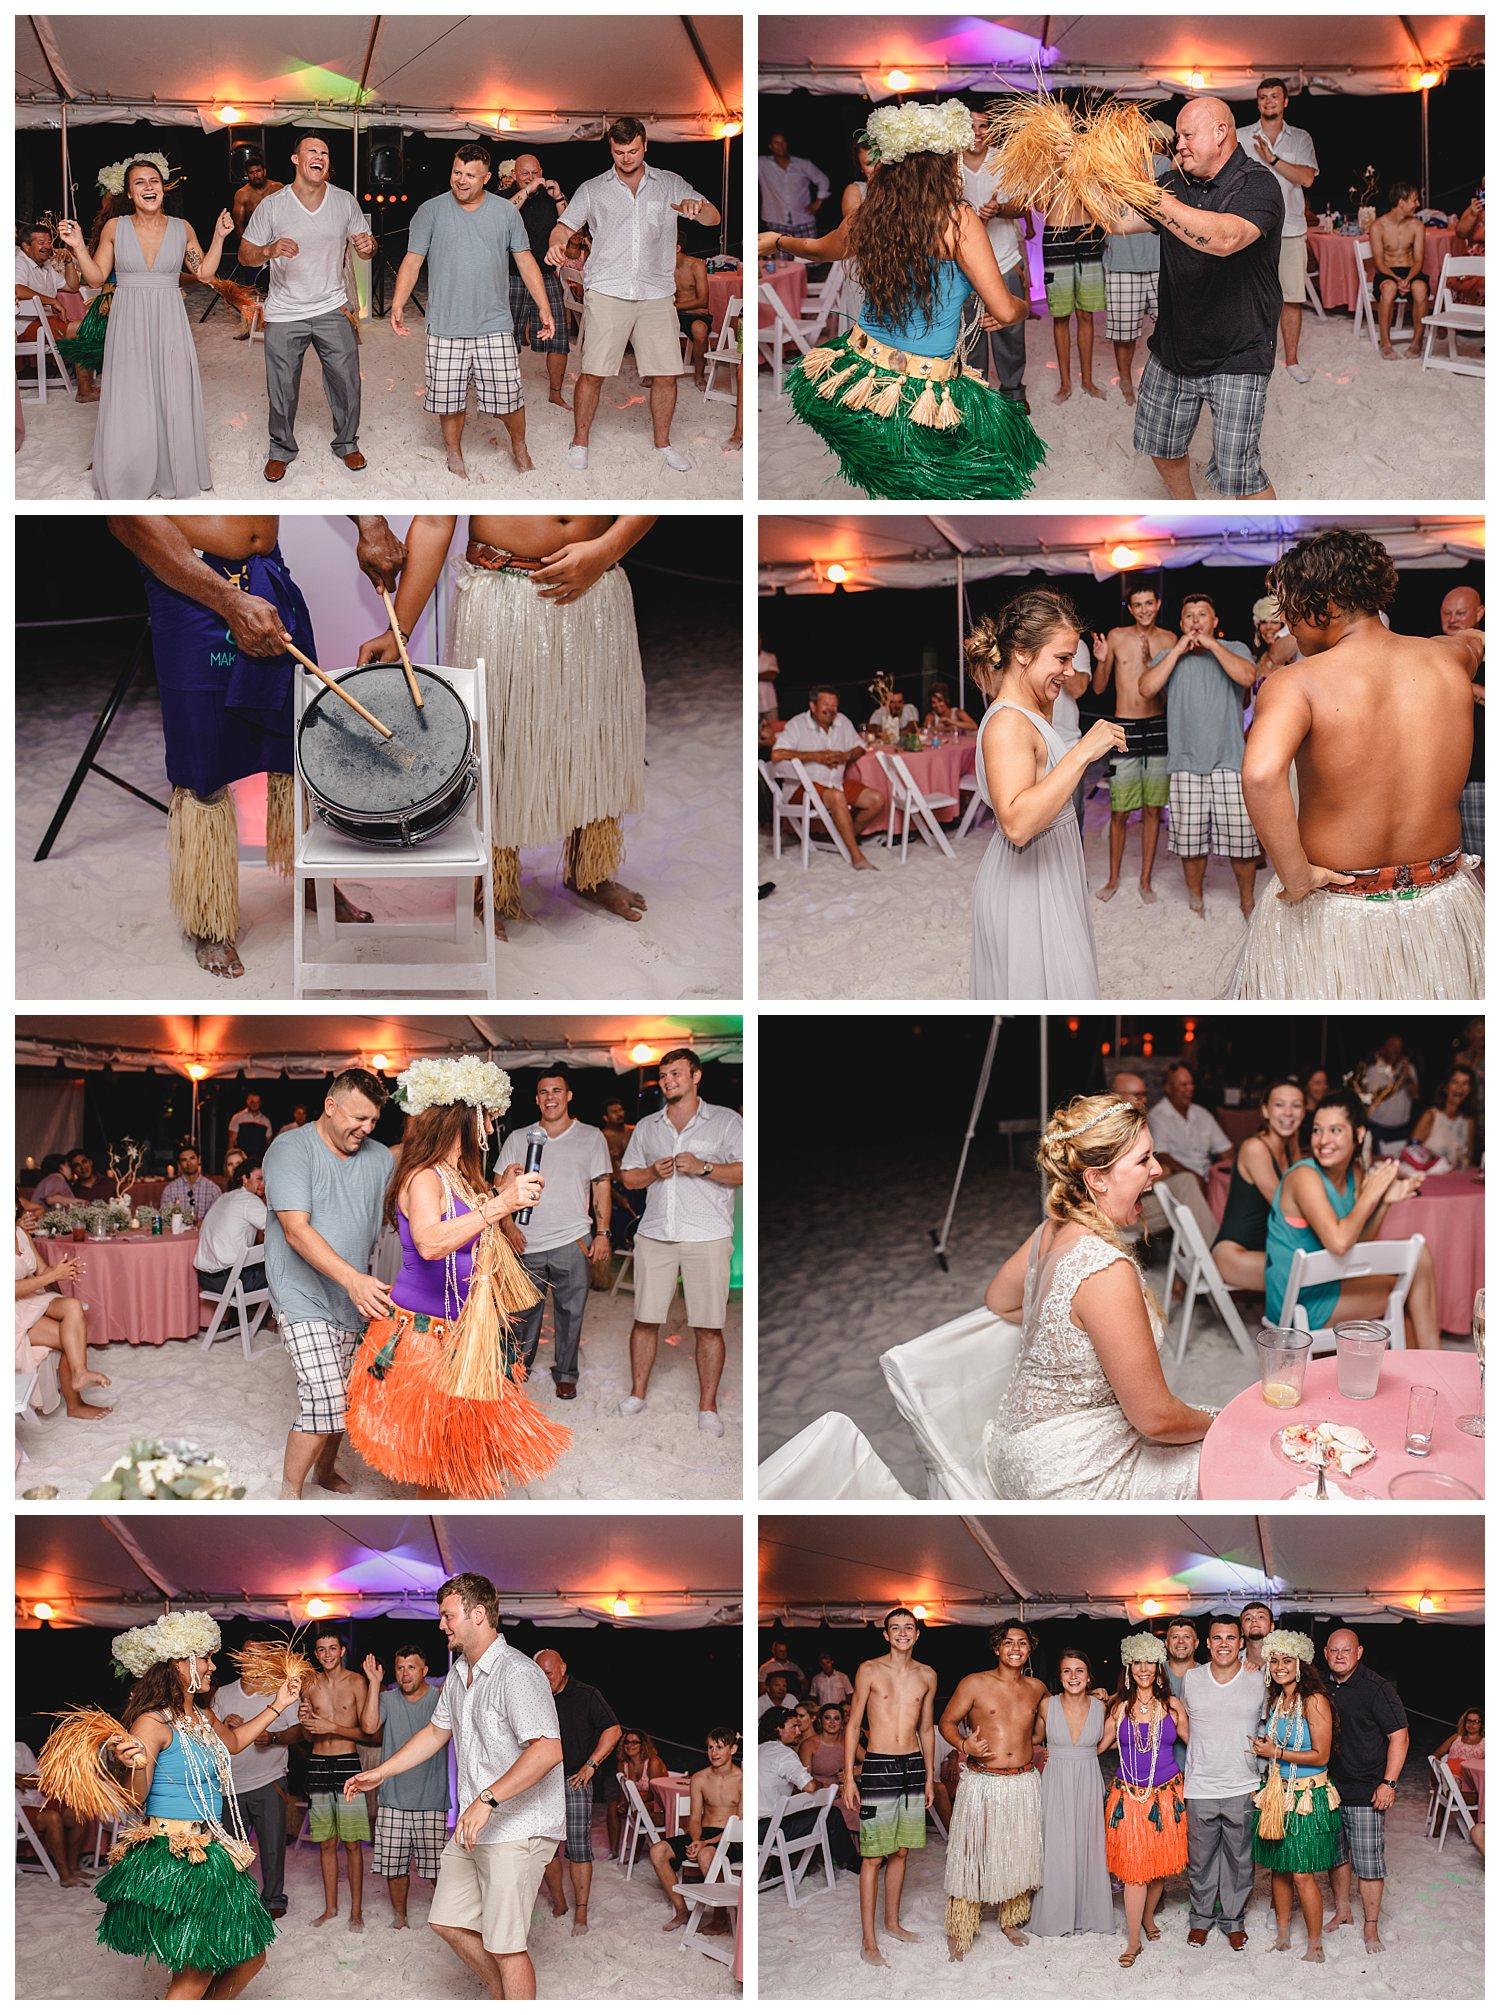 Kelsey_Diane_Photography_Destination_Wedding_Sarasota_Florida_Beach_Wedding_Alex_Austin_0691.jpg